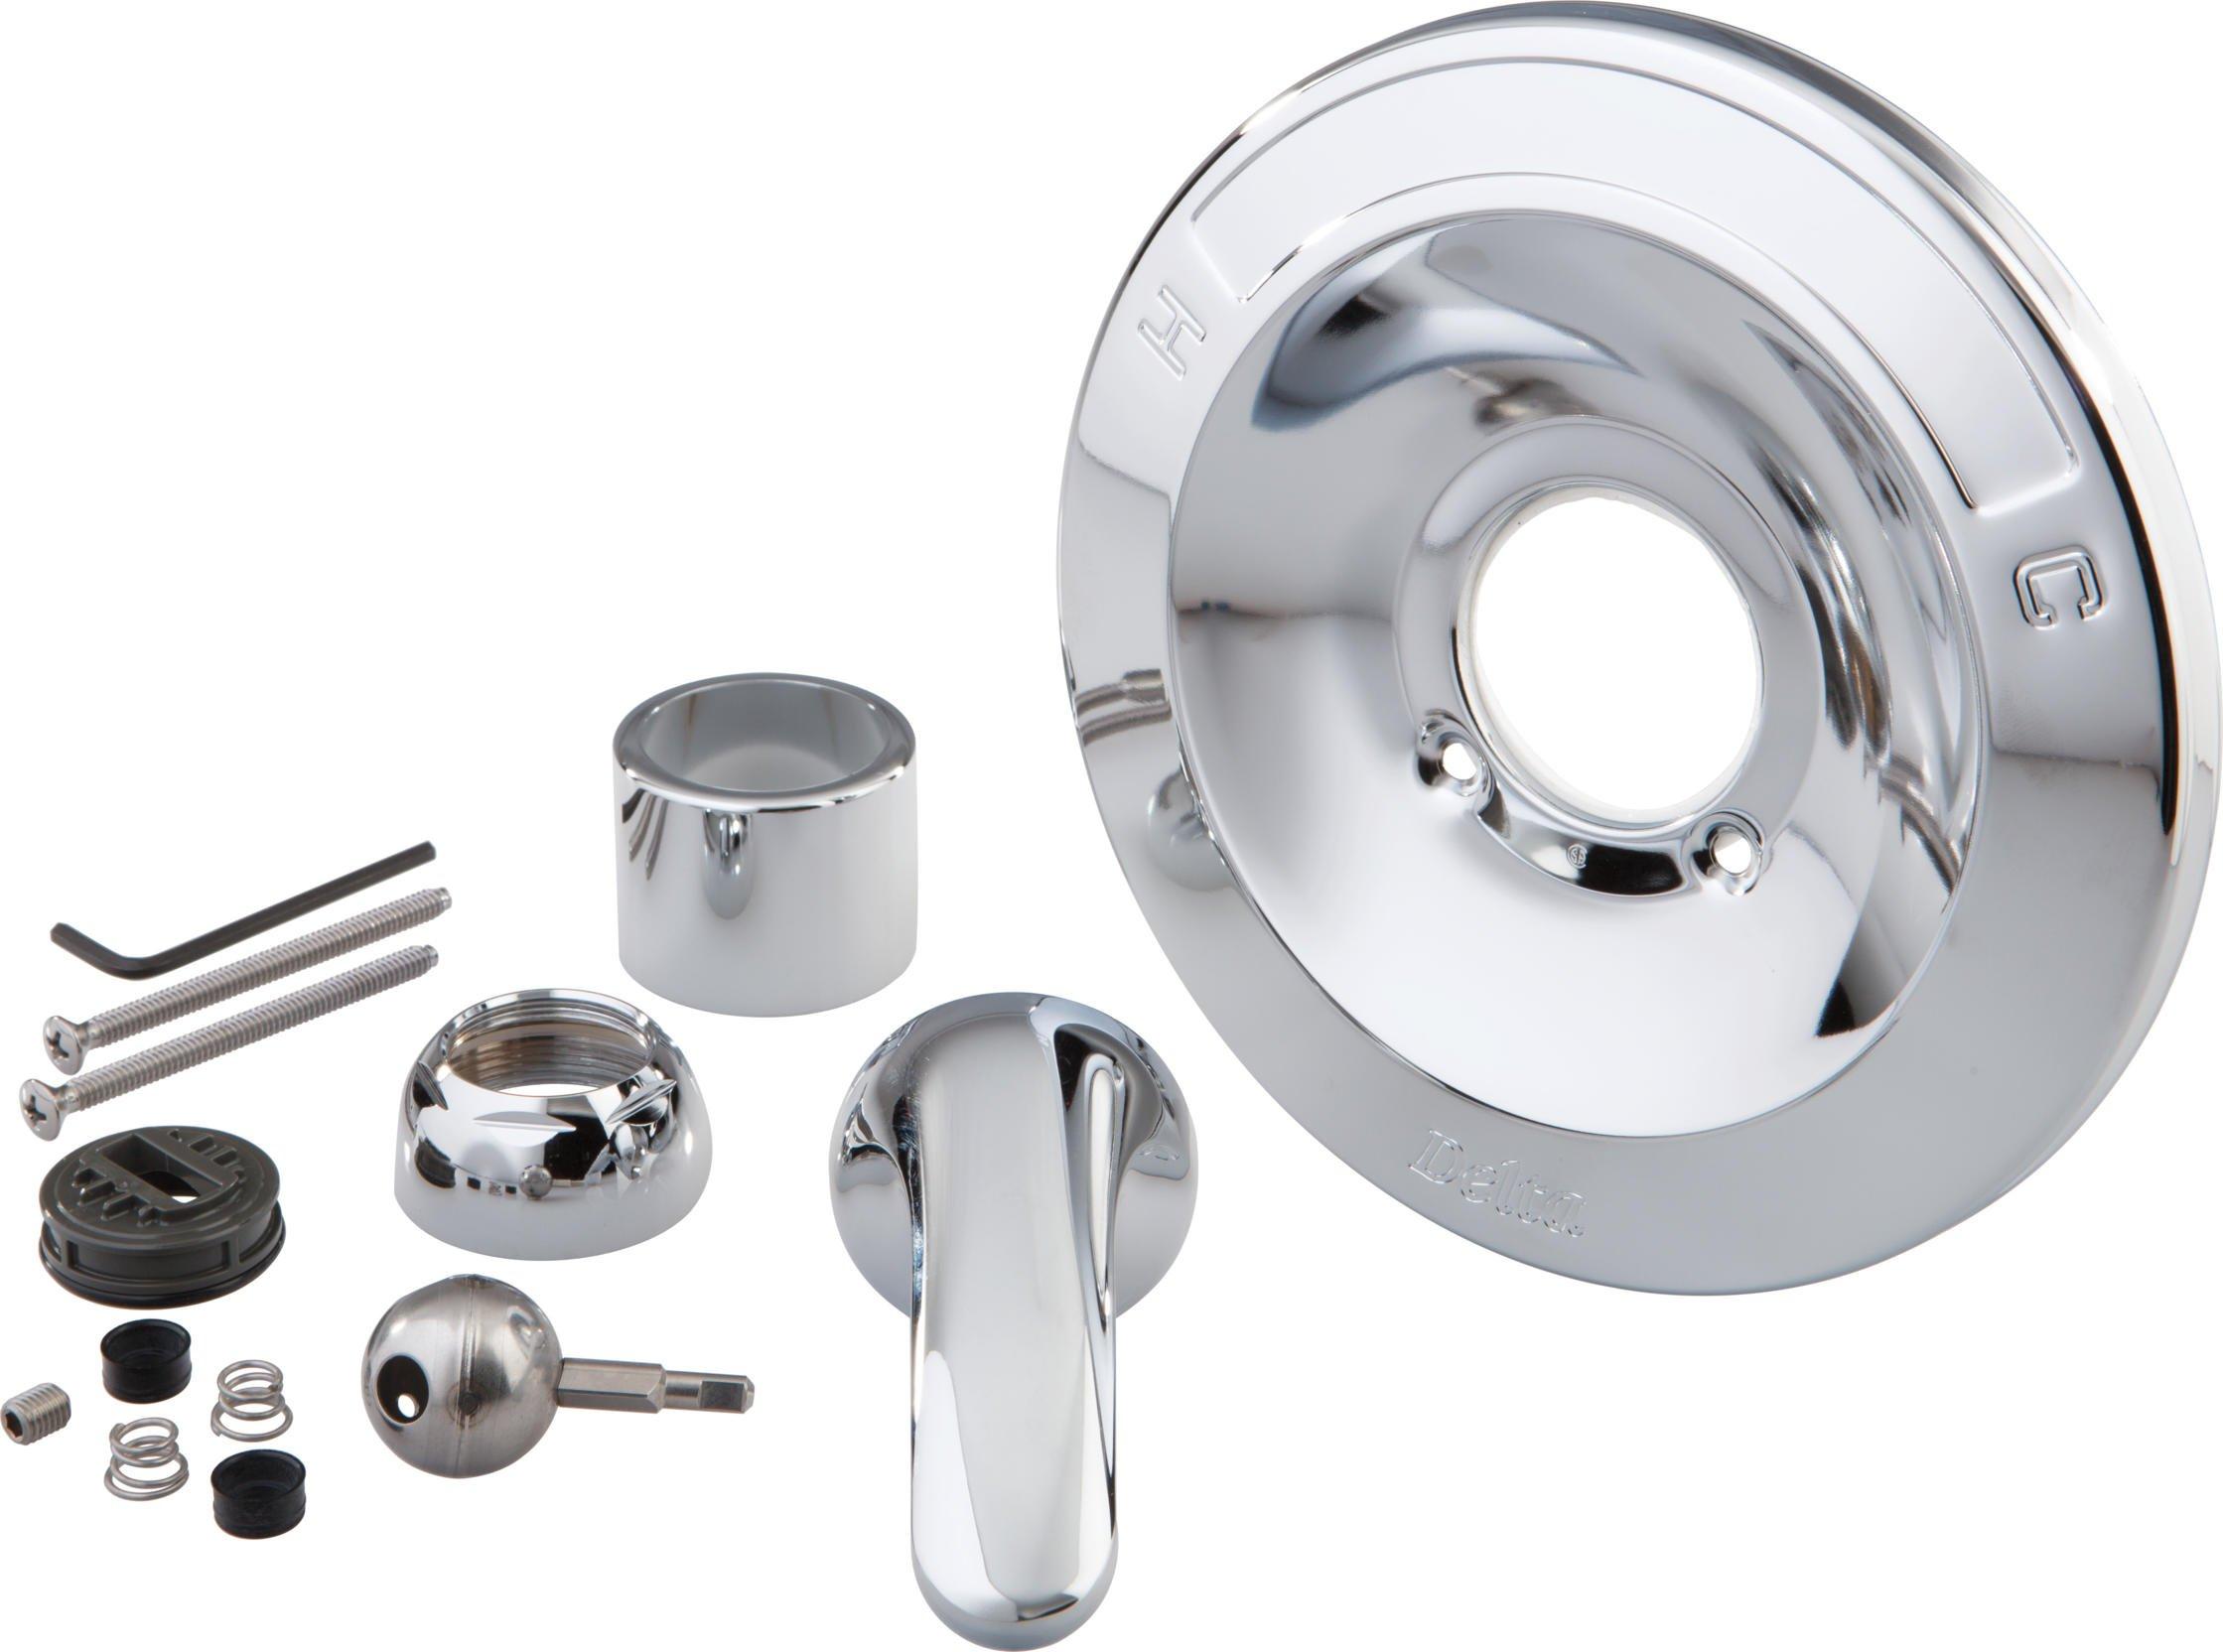 delta faucet repair kits amazon com rh amazon com delta bathroom faucet repair single handle delta bathroom faucet repair single handle